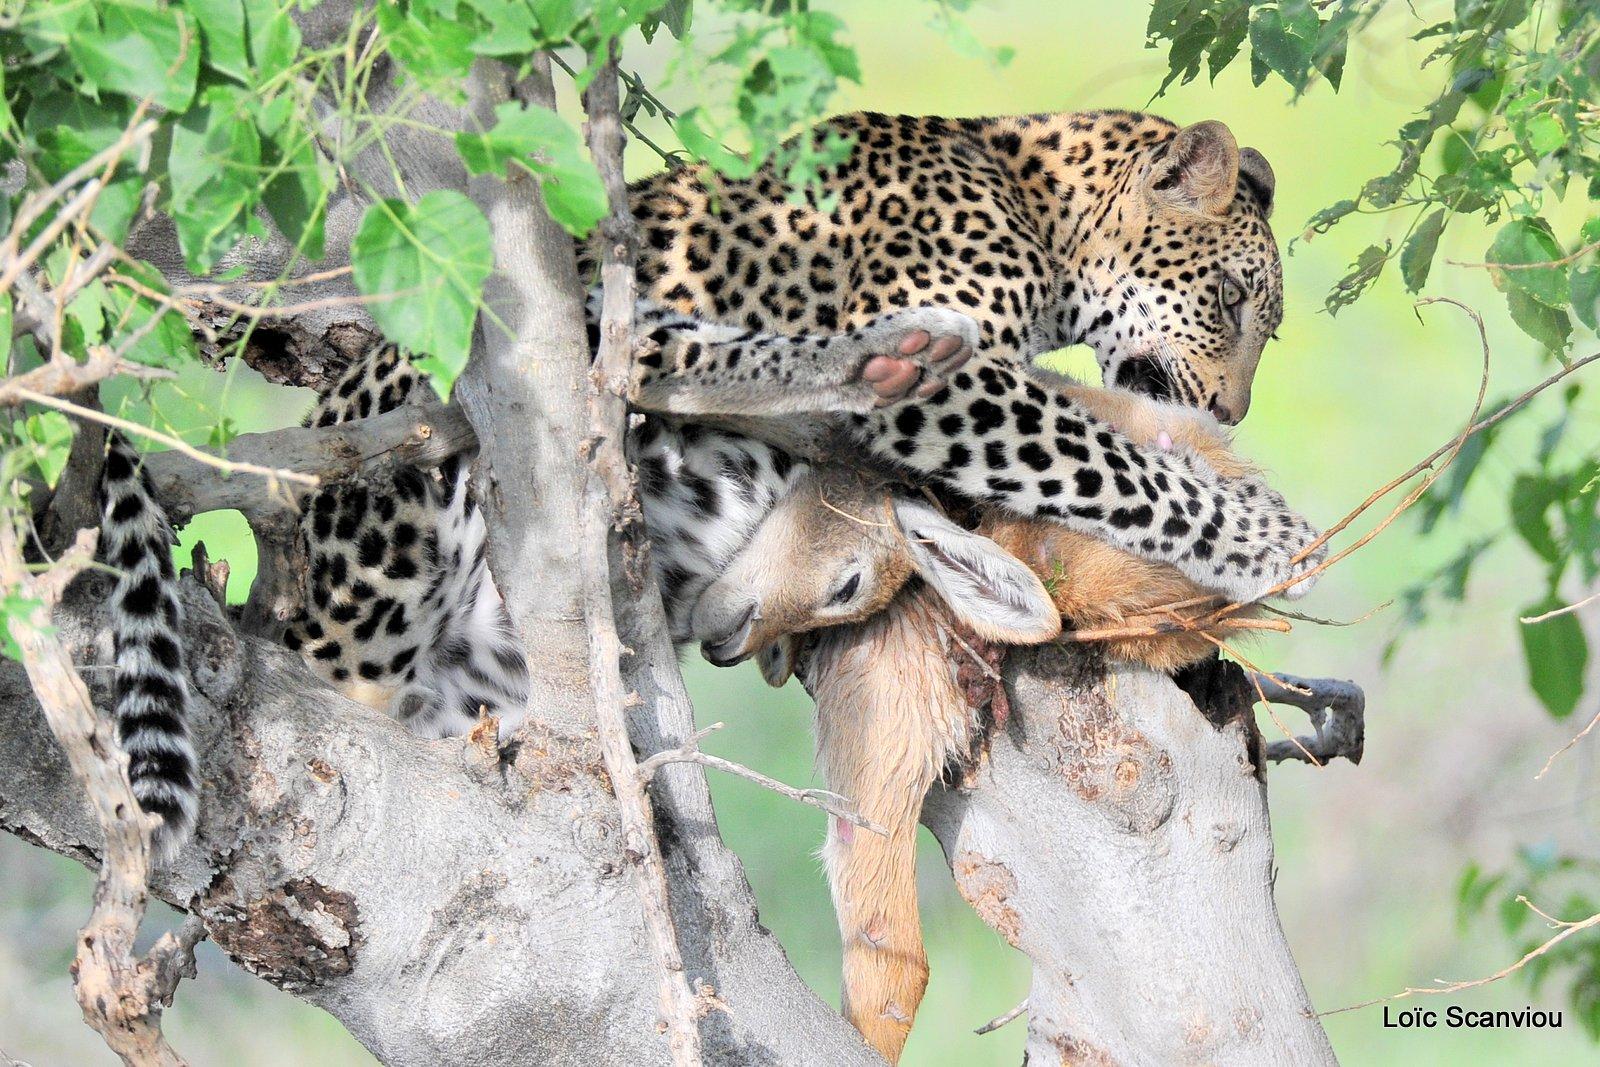 Léopard qui mange/Leopard eating (3)